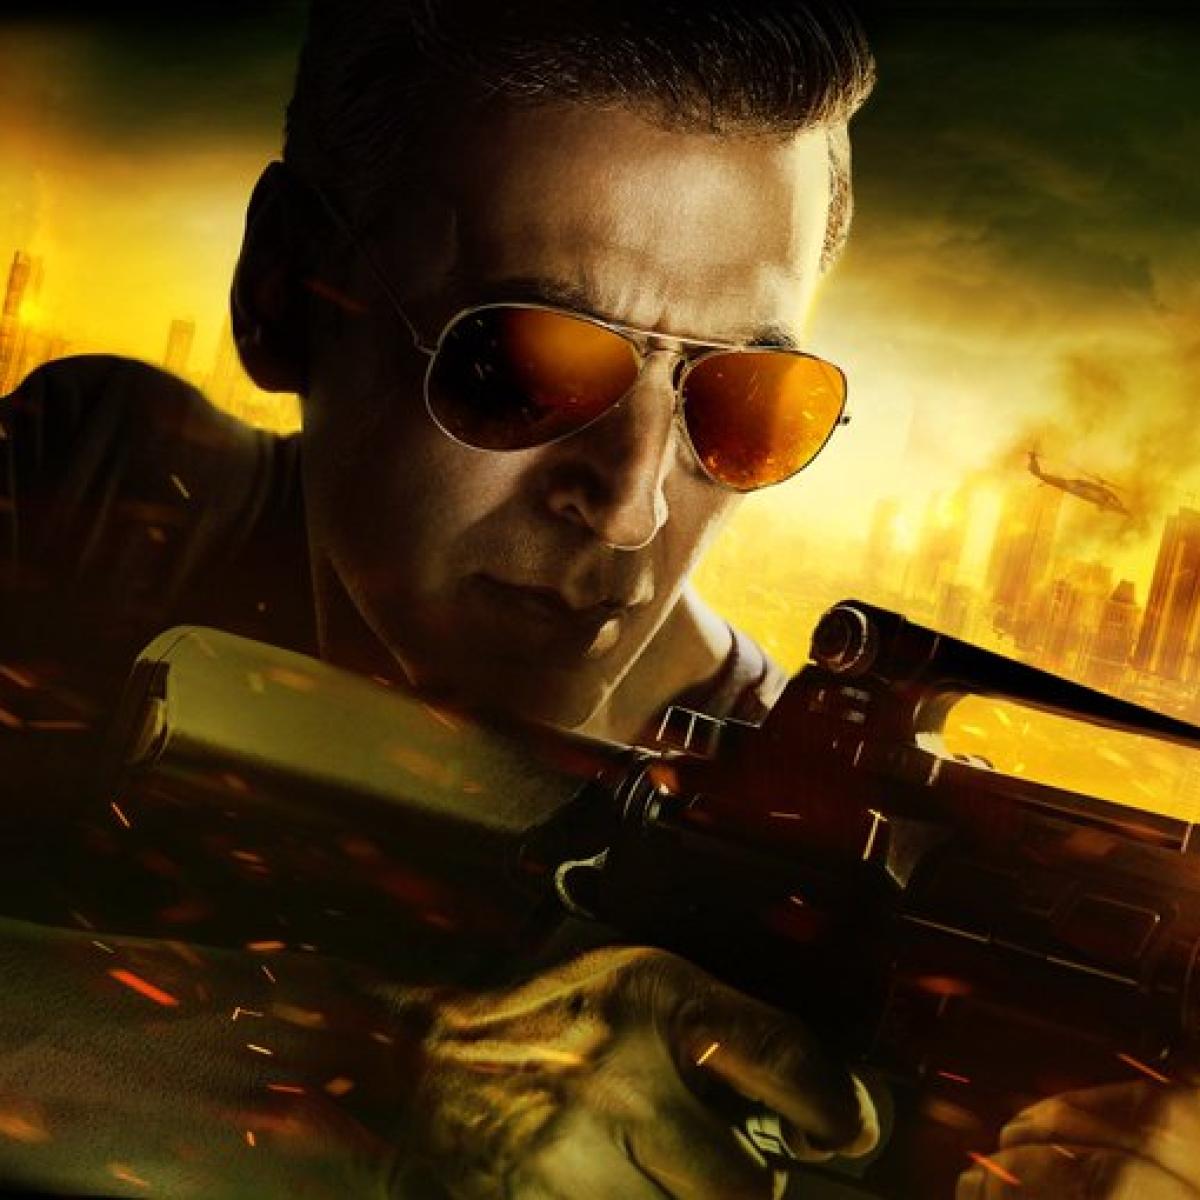 Akshay Kumar's 'Sooryavanshi' postponed once again, Rohit Shetty directorial won't release on April 30